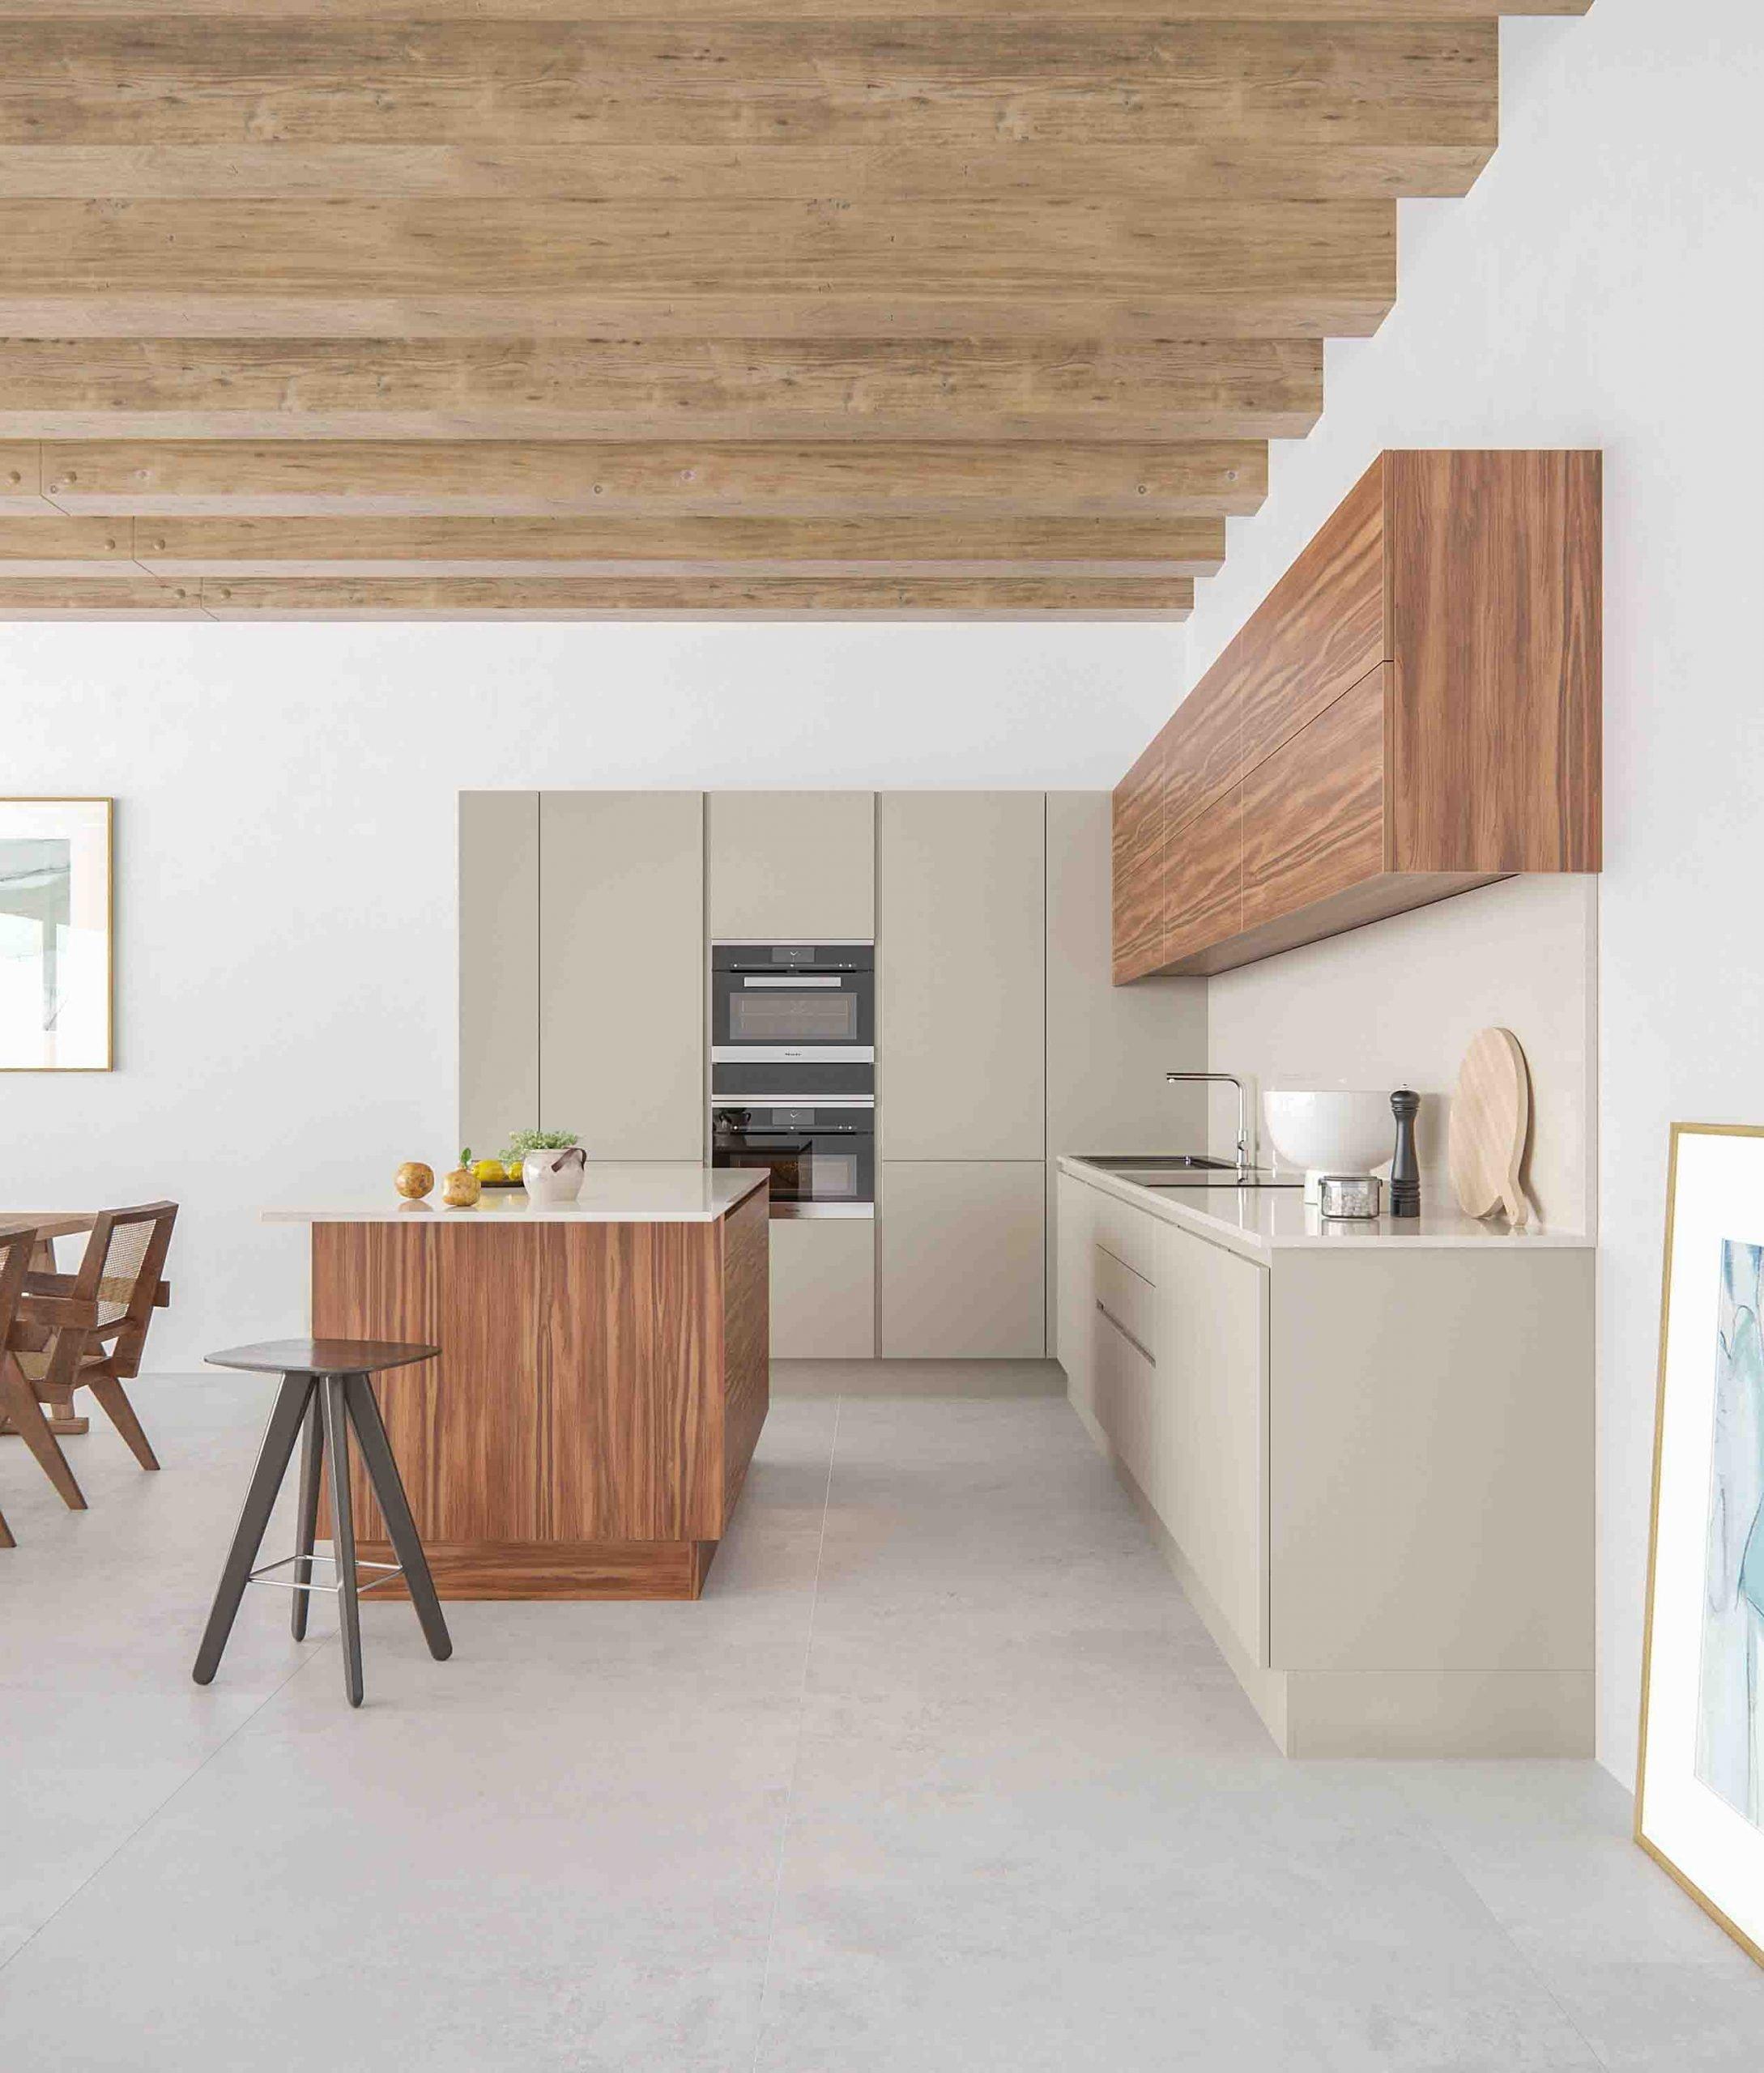 https://dprostudio.com/wp-content/uploads/2021/01/GRIXTI01_kitchen_mediterranea_hq_cam4-scaled.jpg